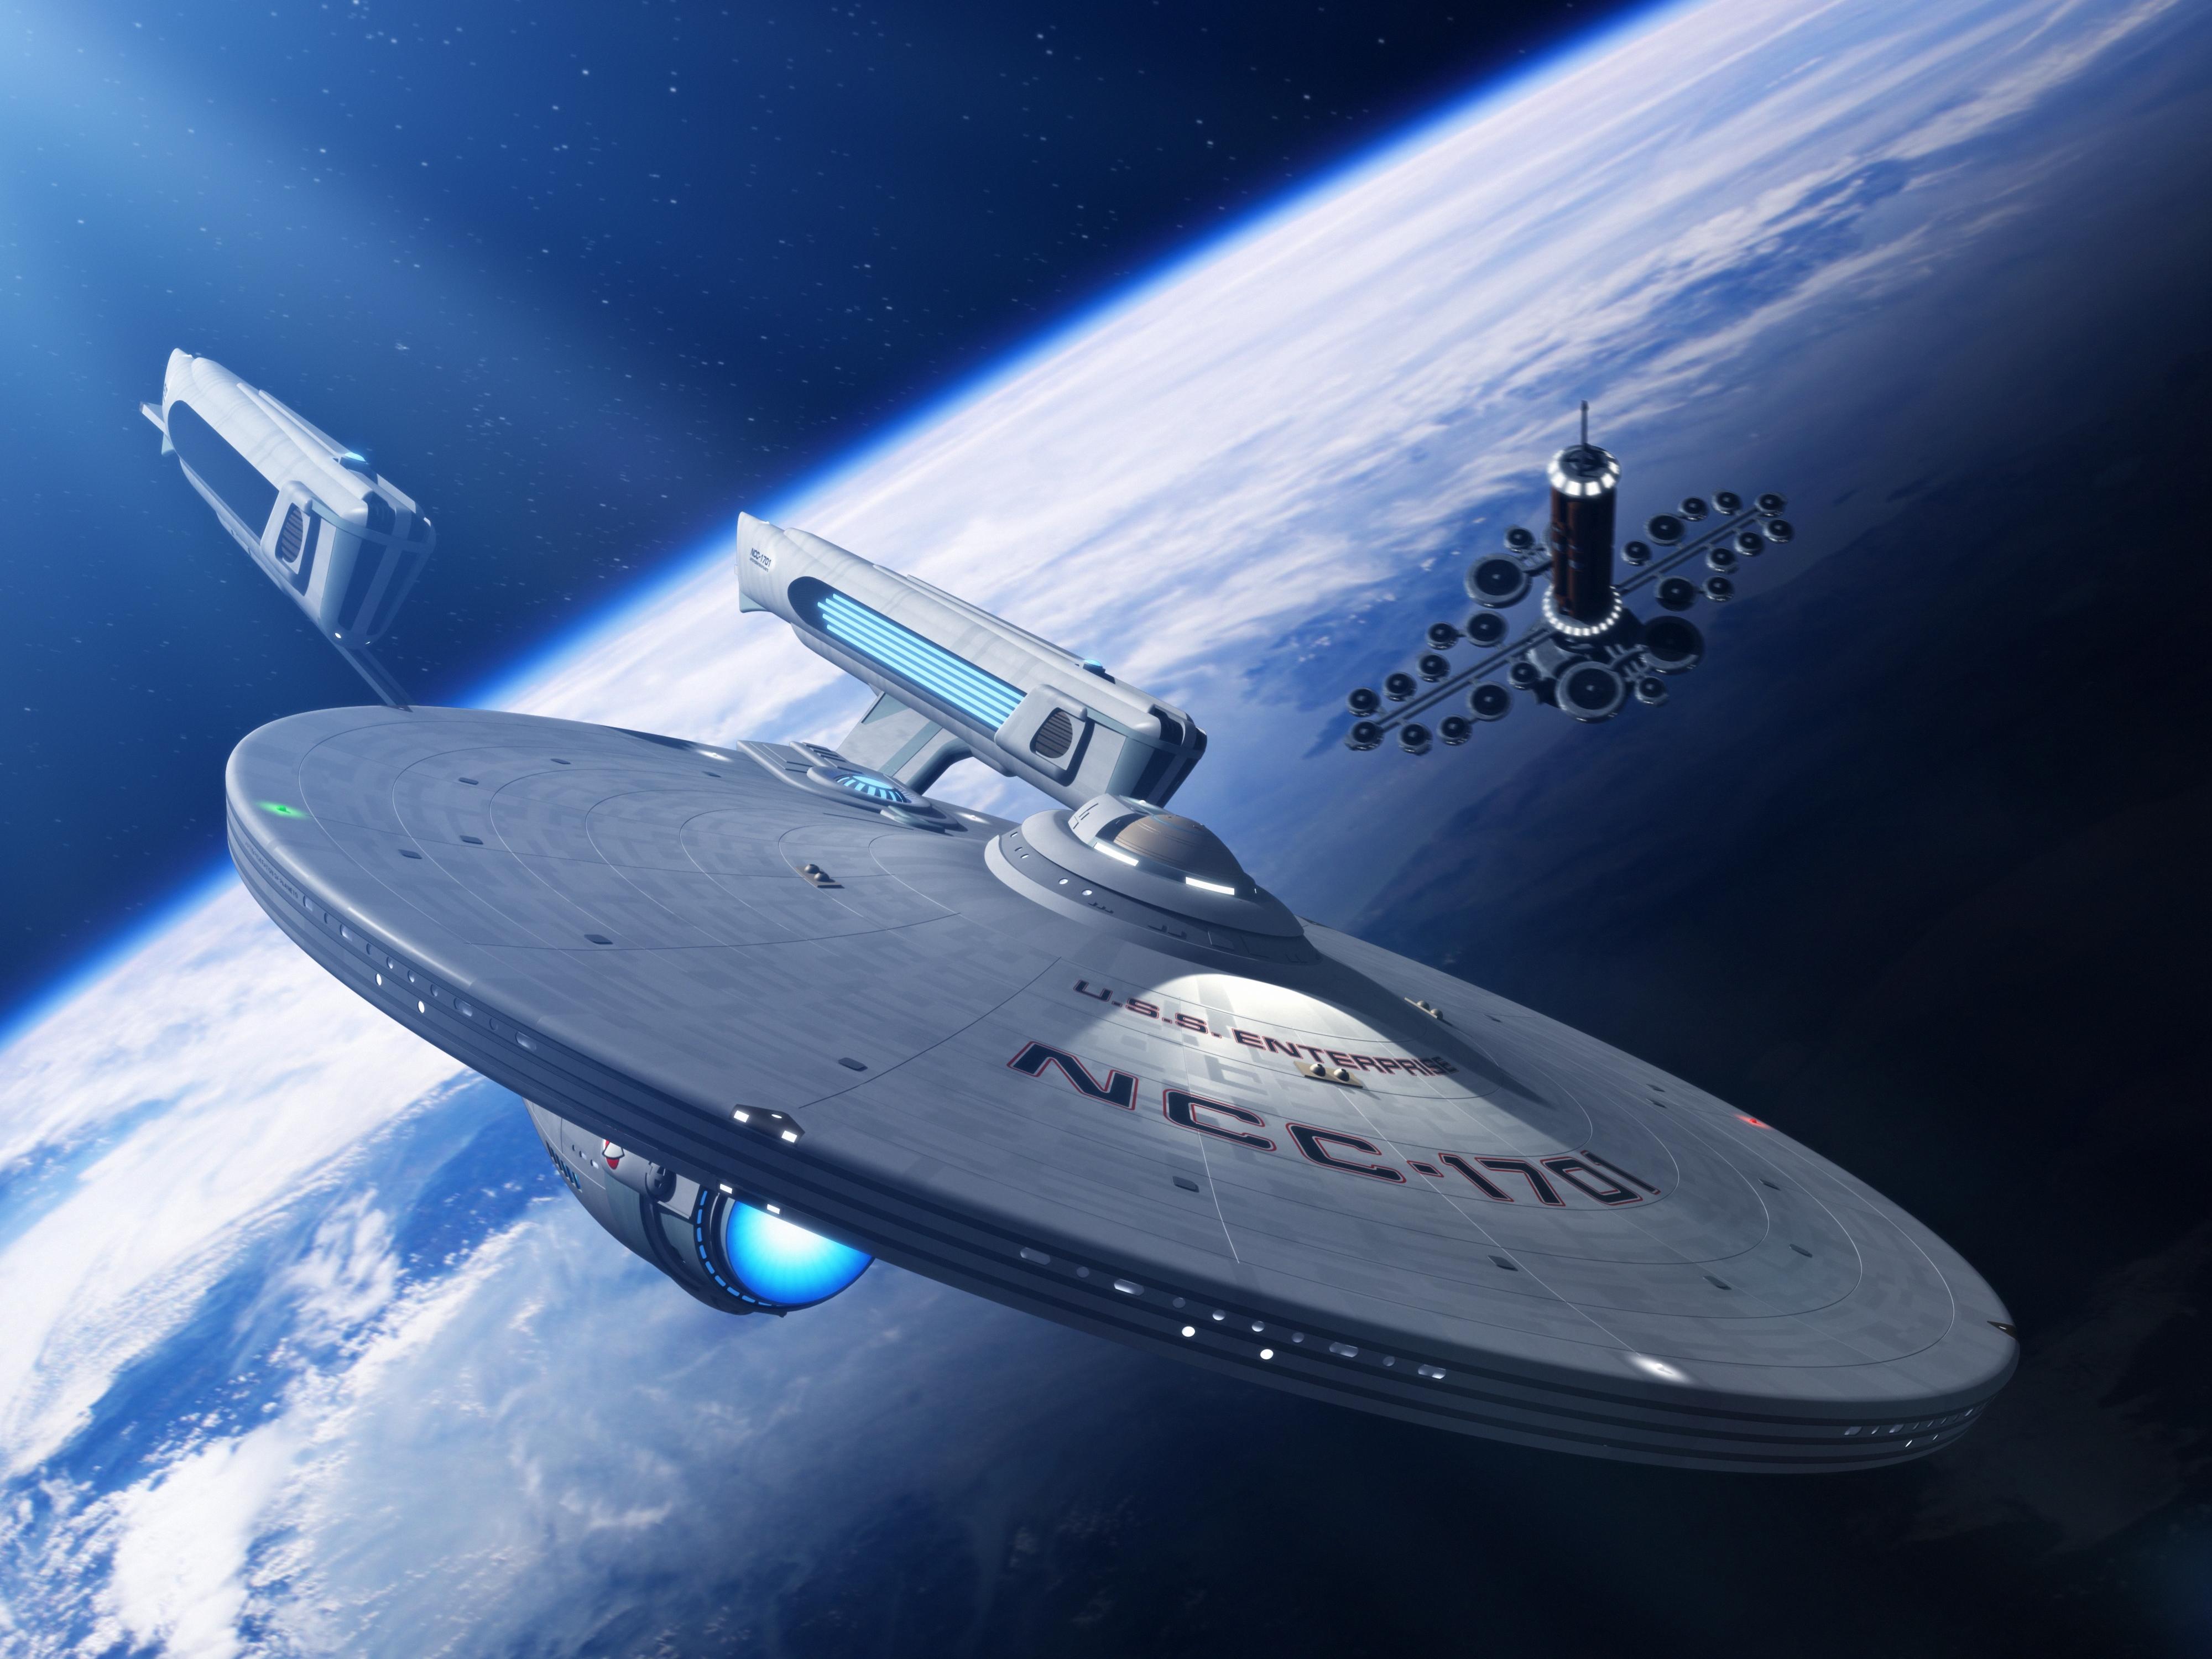 My freedom by thefirstfleet